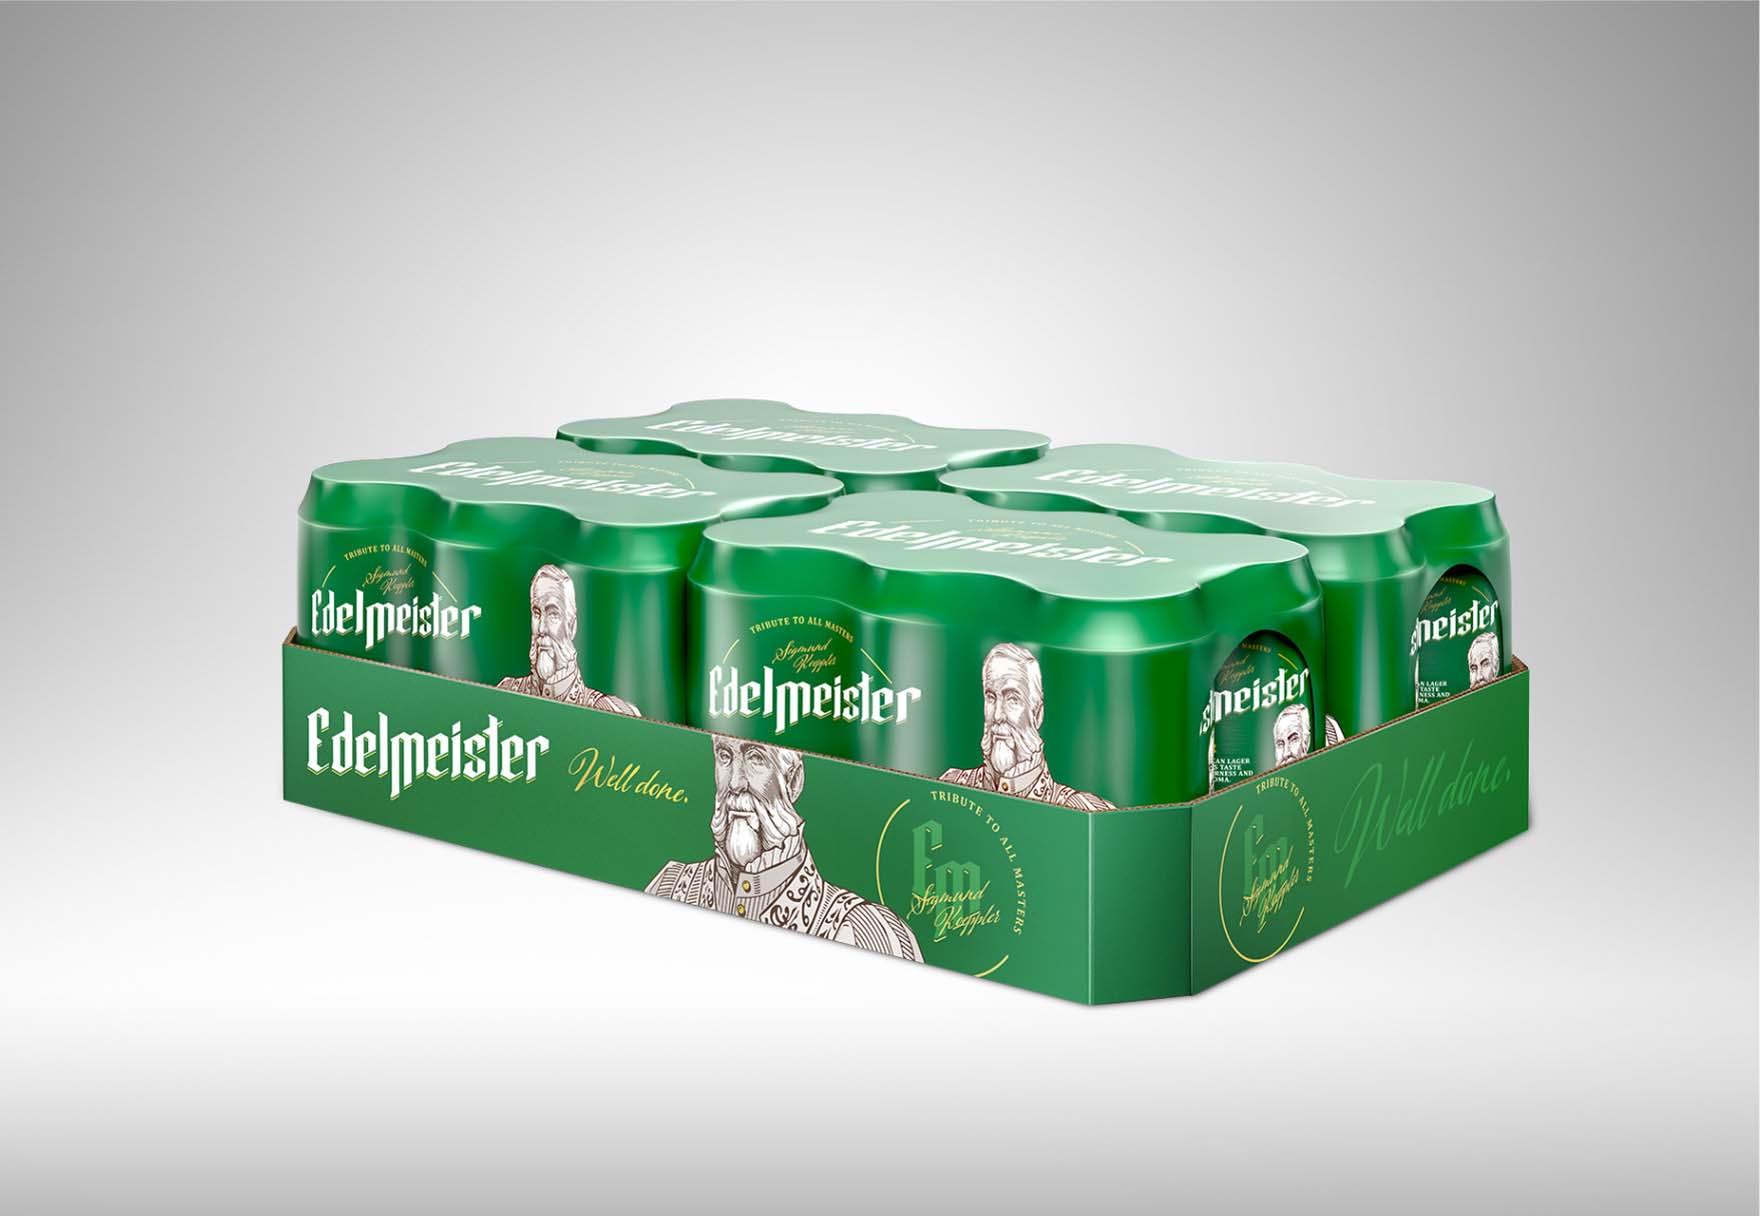 Rebranding Marki Piwa Edelmeister